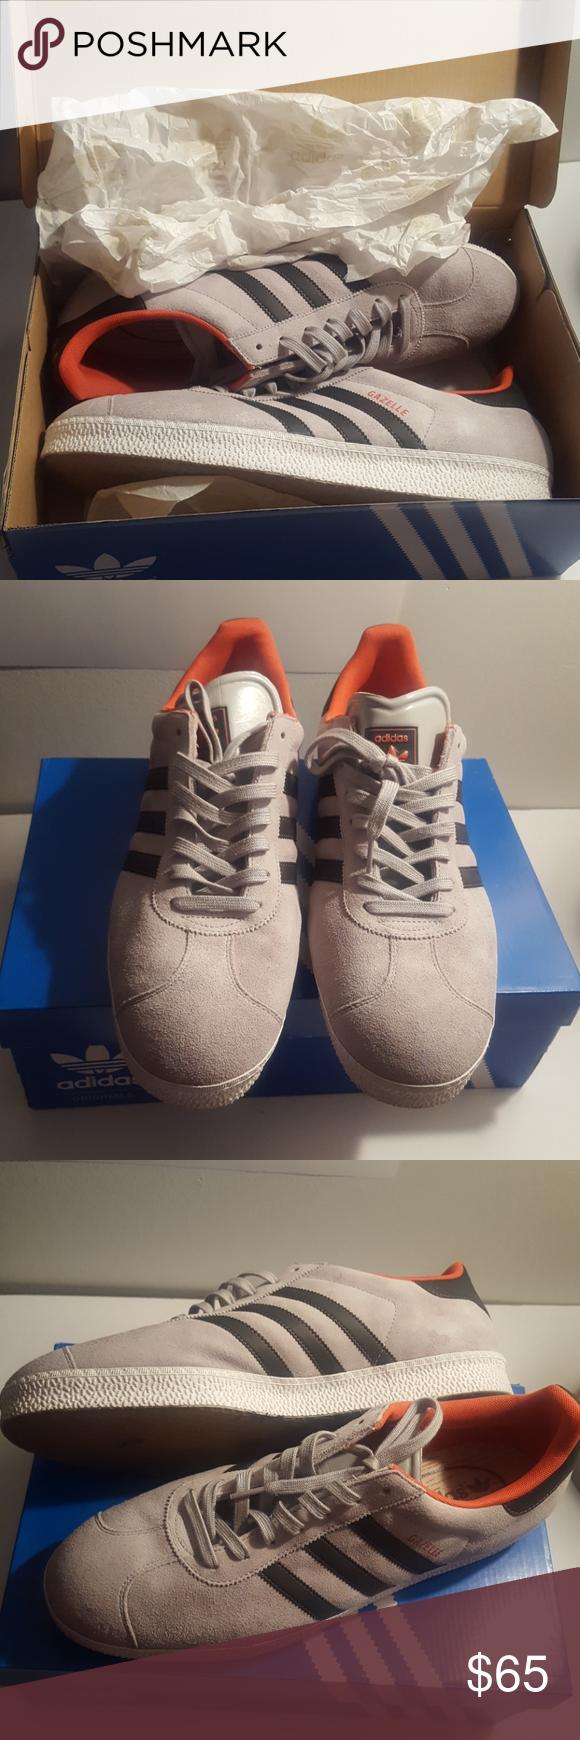 Orange sneakers, Adidas gazelle mens